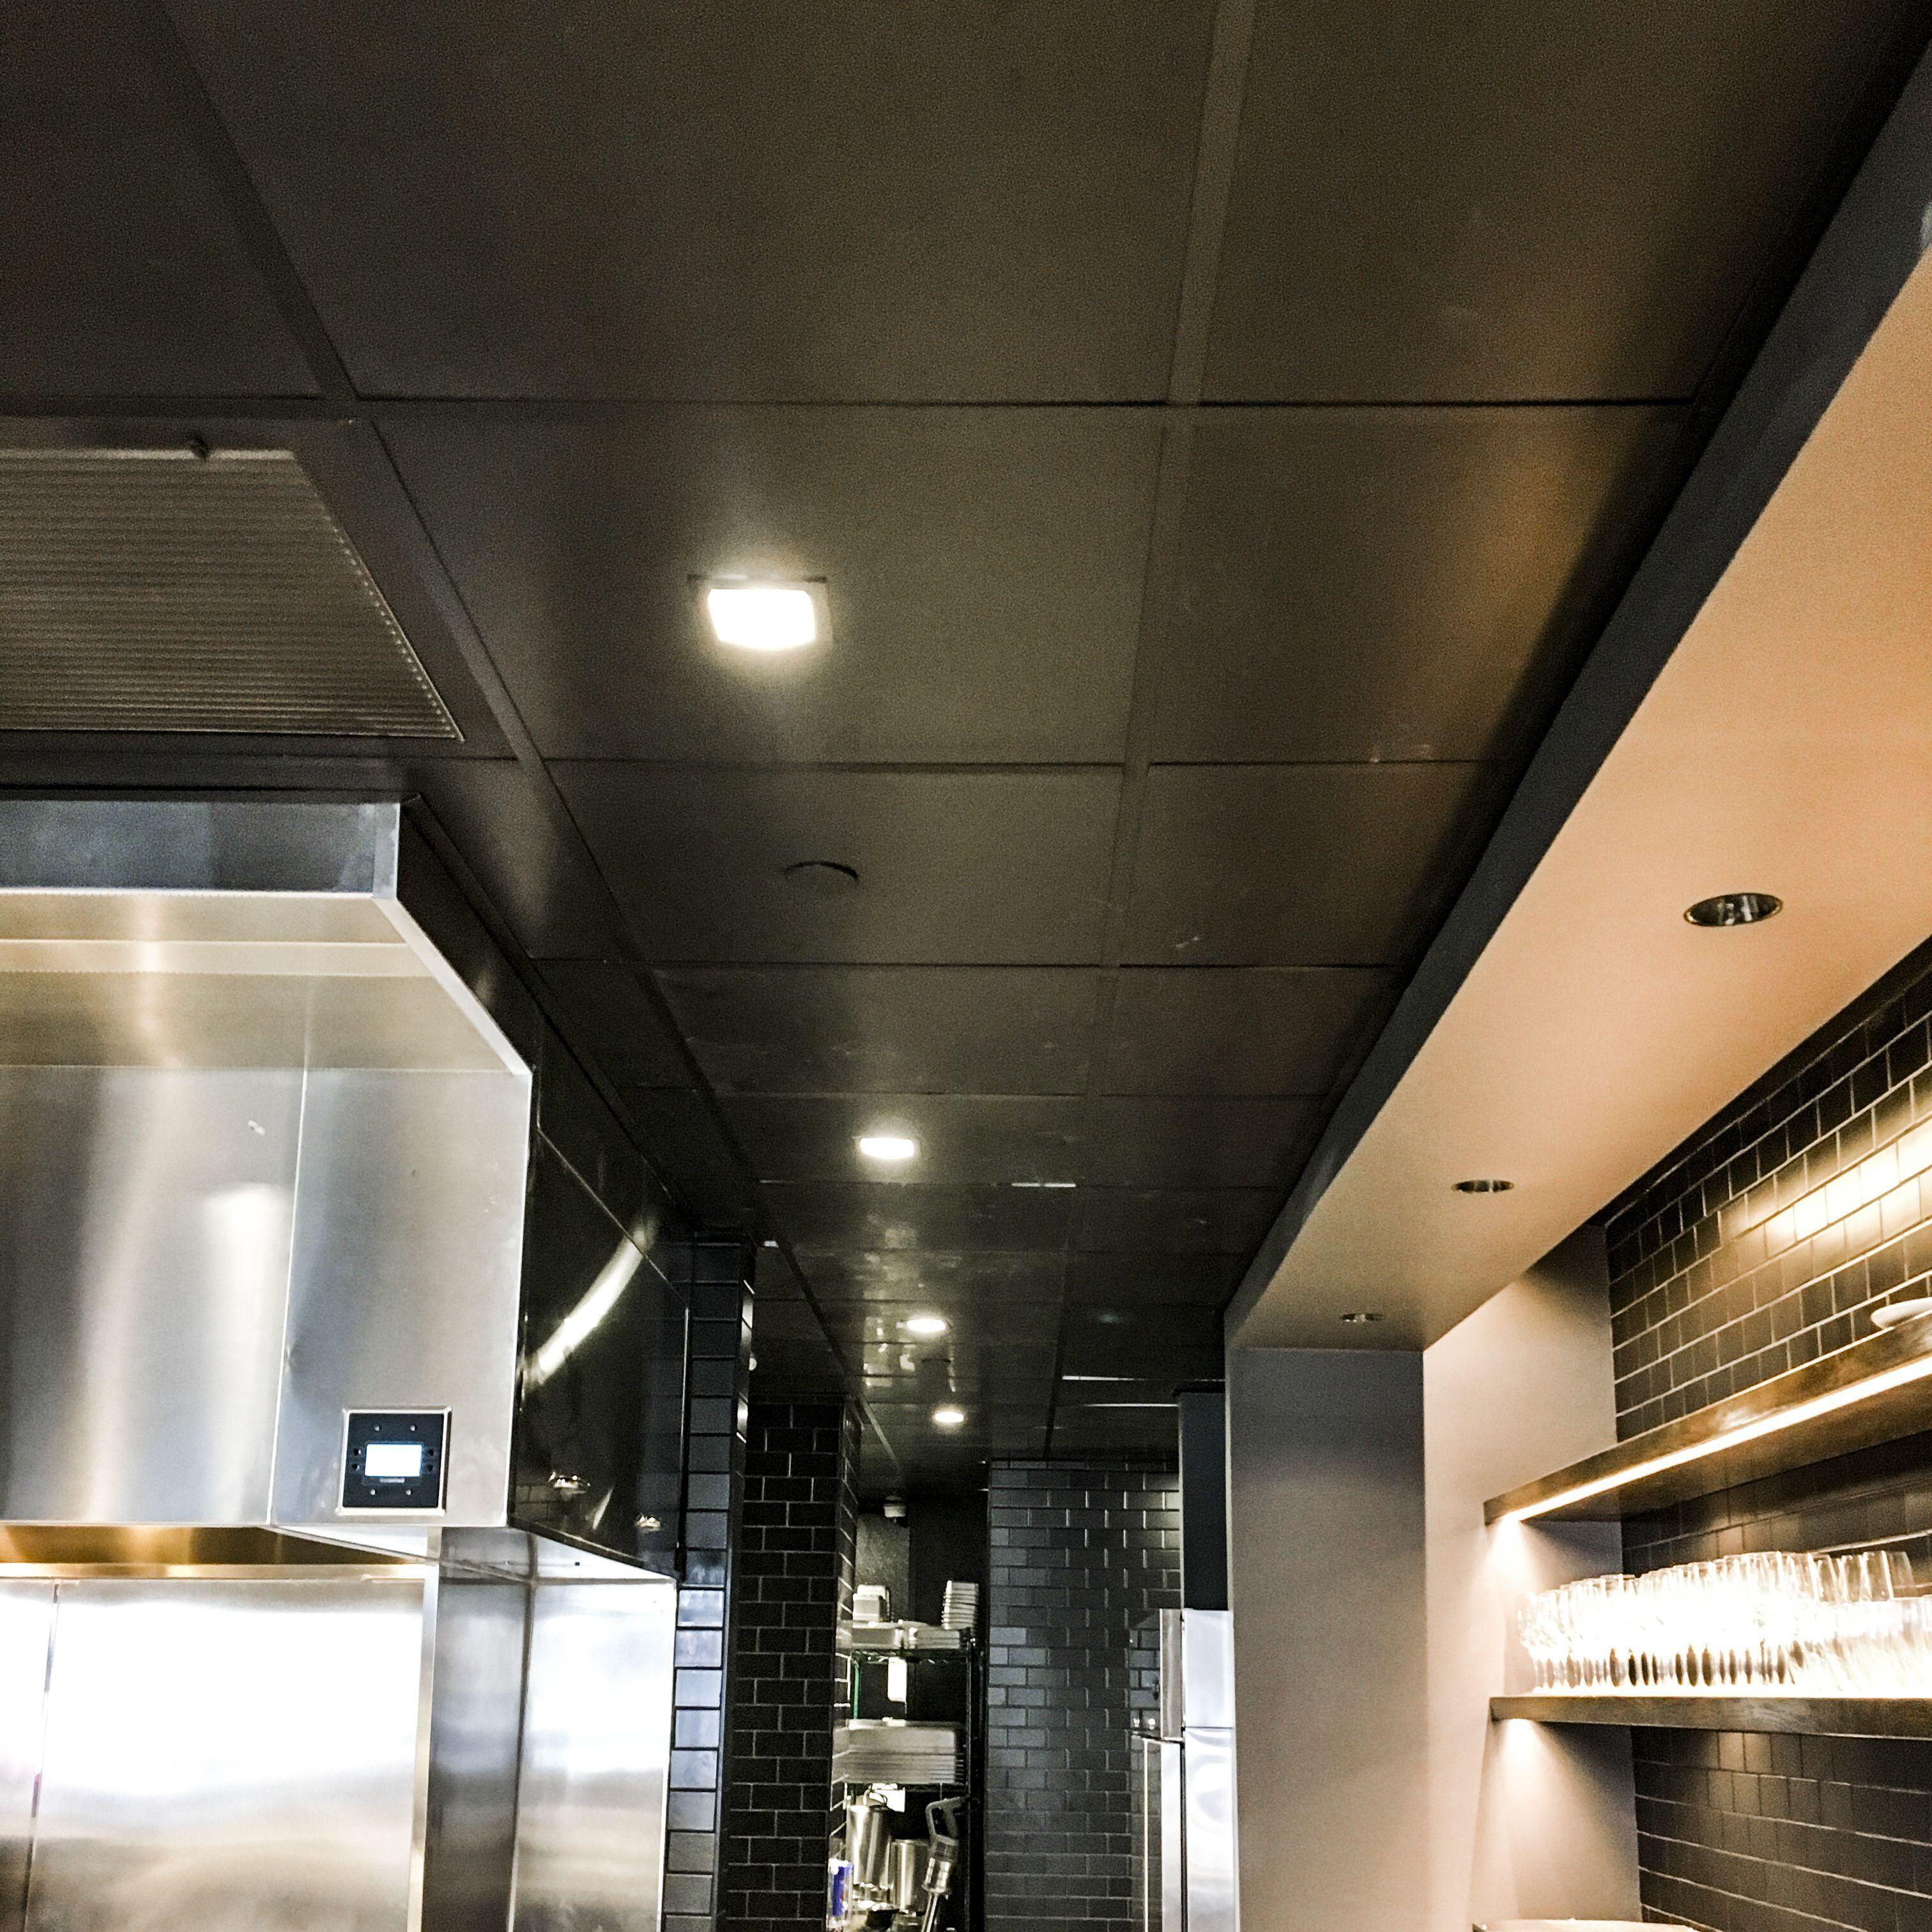 Plafond Et Murdecoration Idees Plafondetmurdecoration